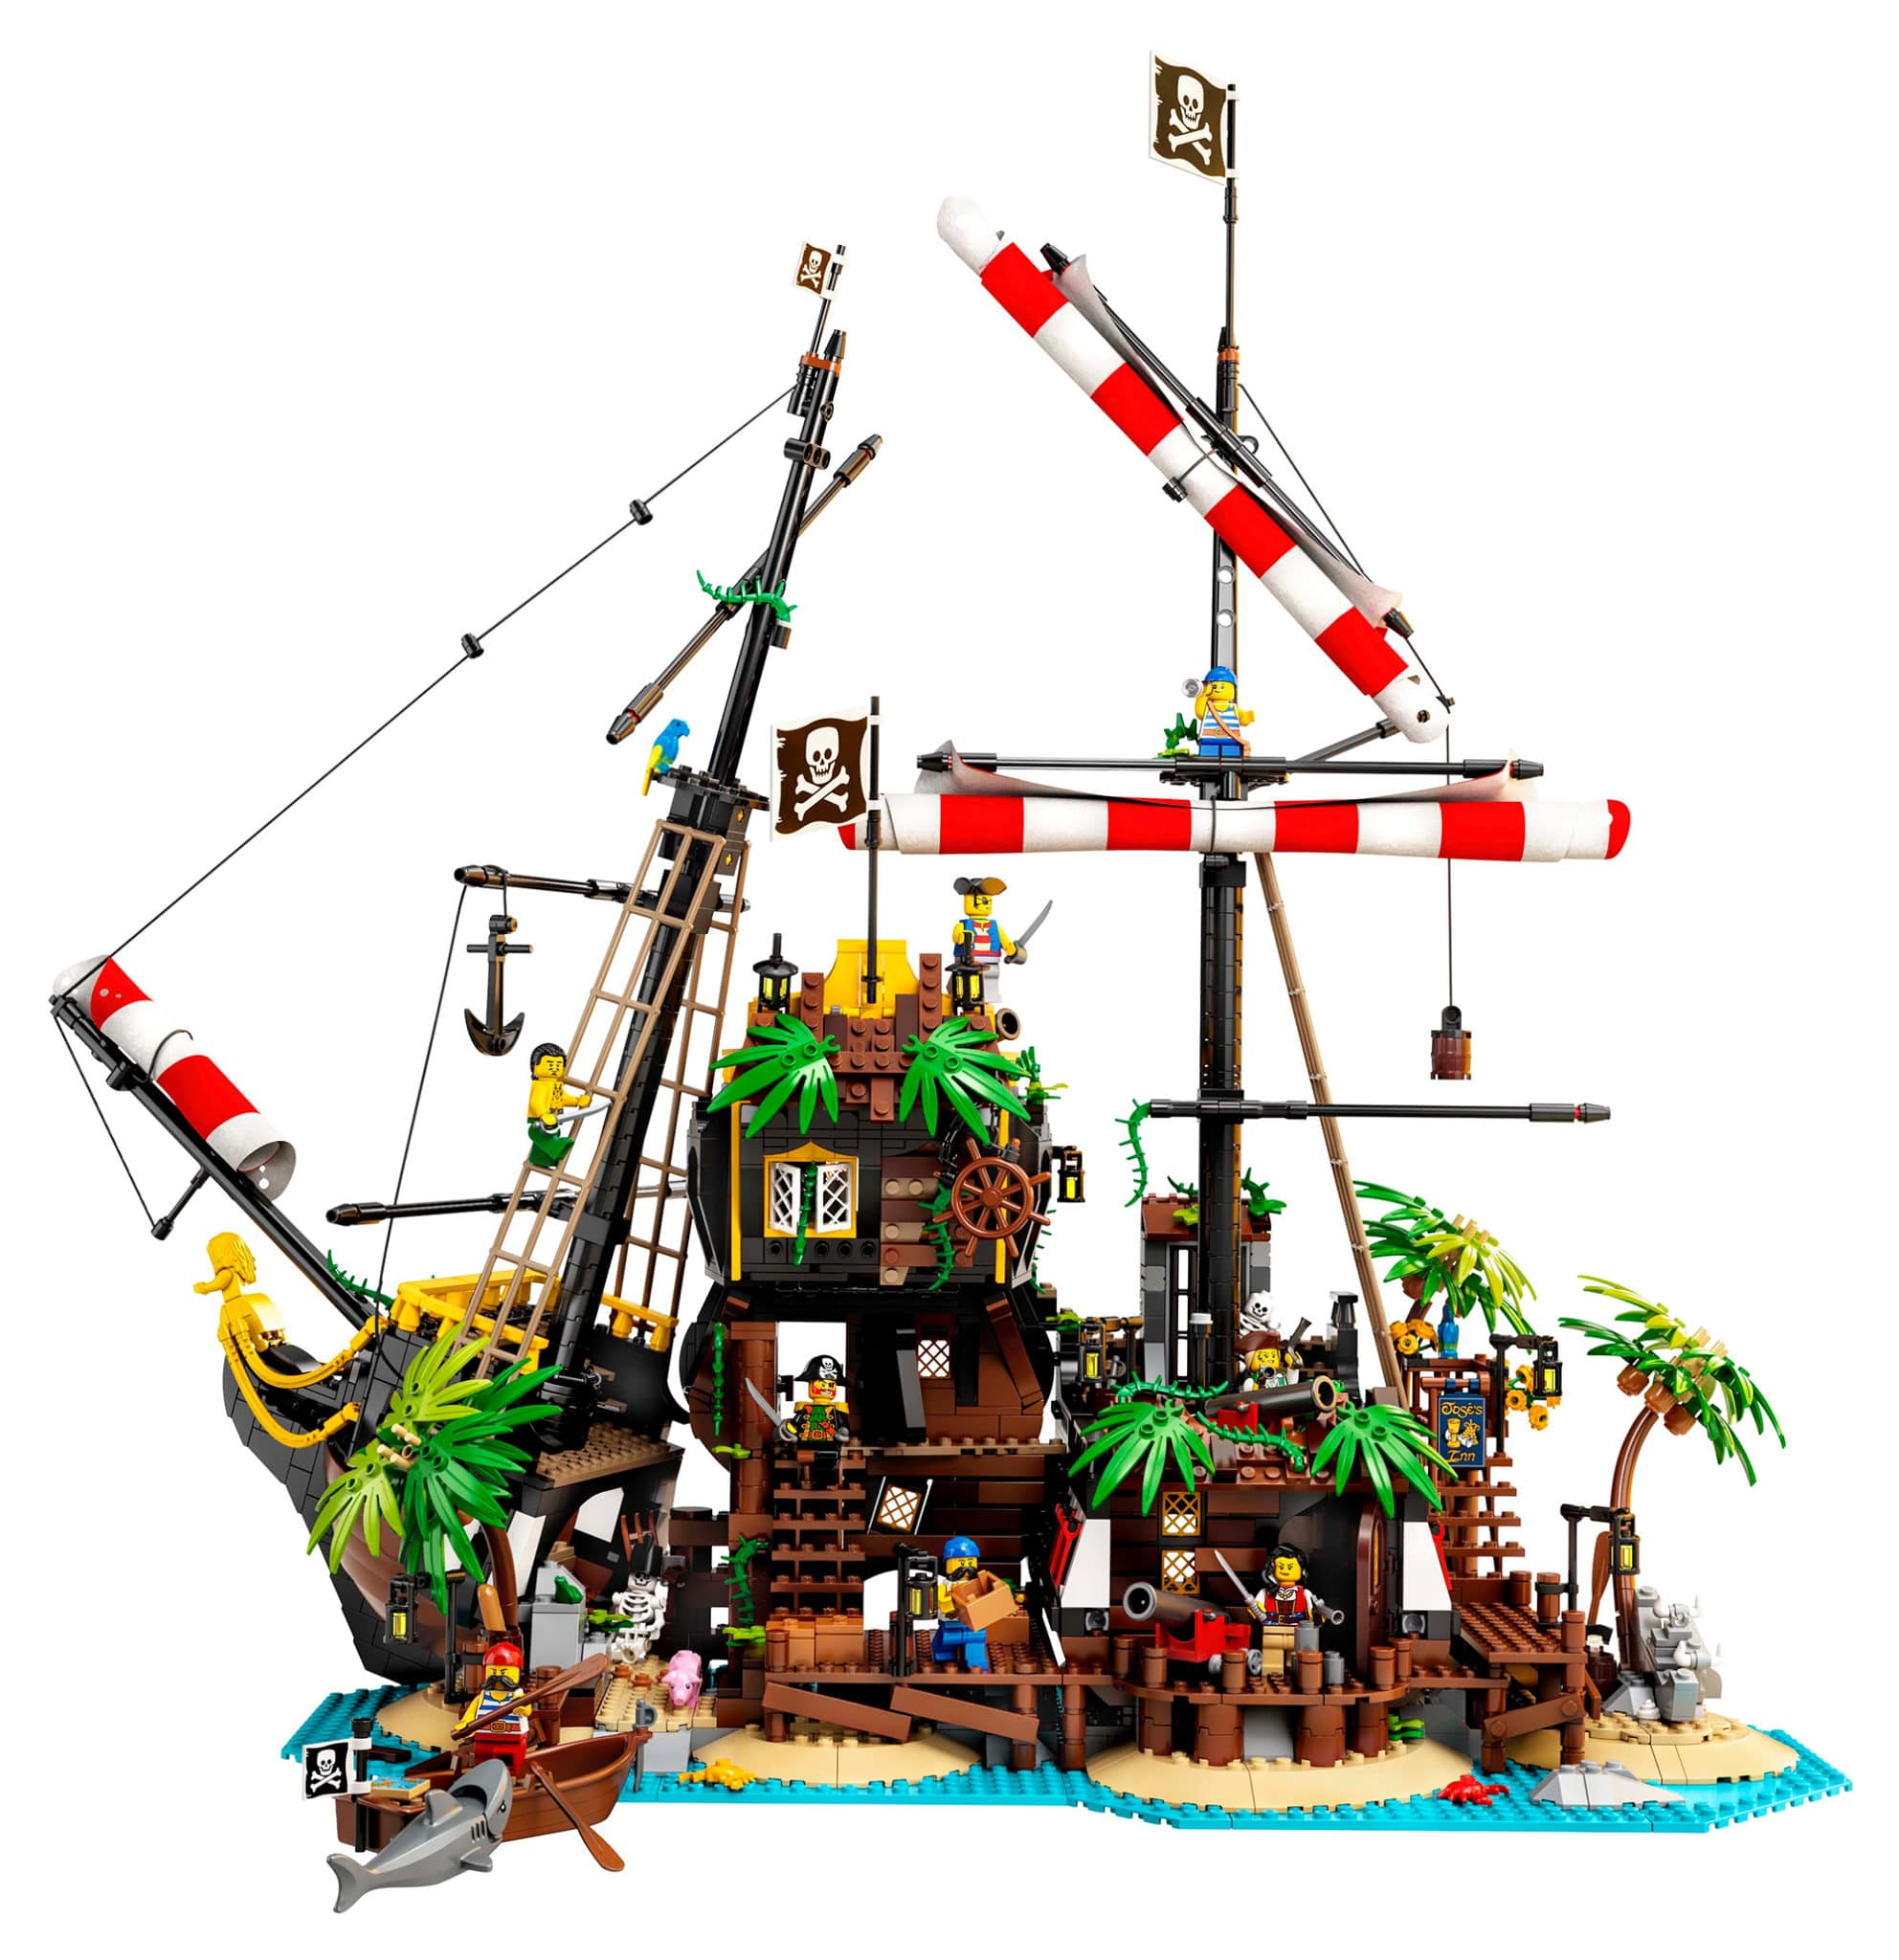 LEGO 21322 Pirate of Barracuda Bay (Seitenansicht)